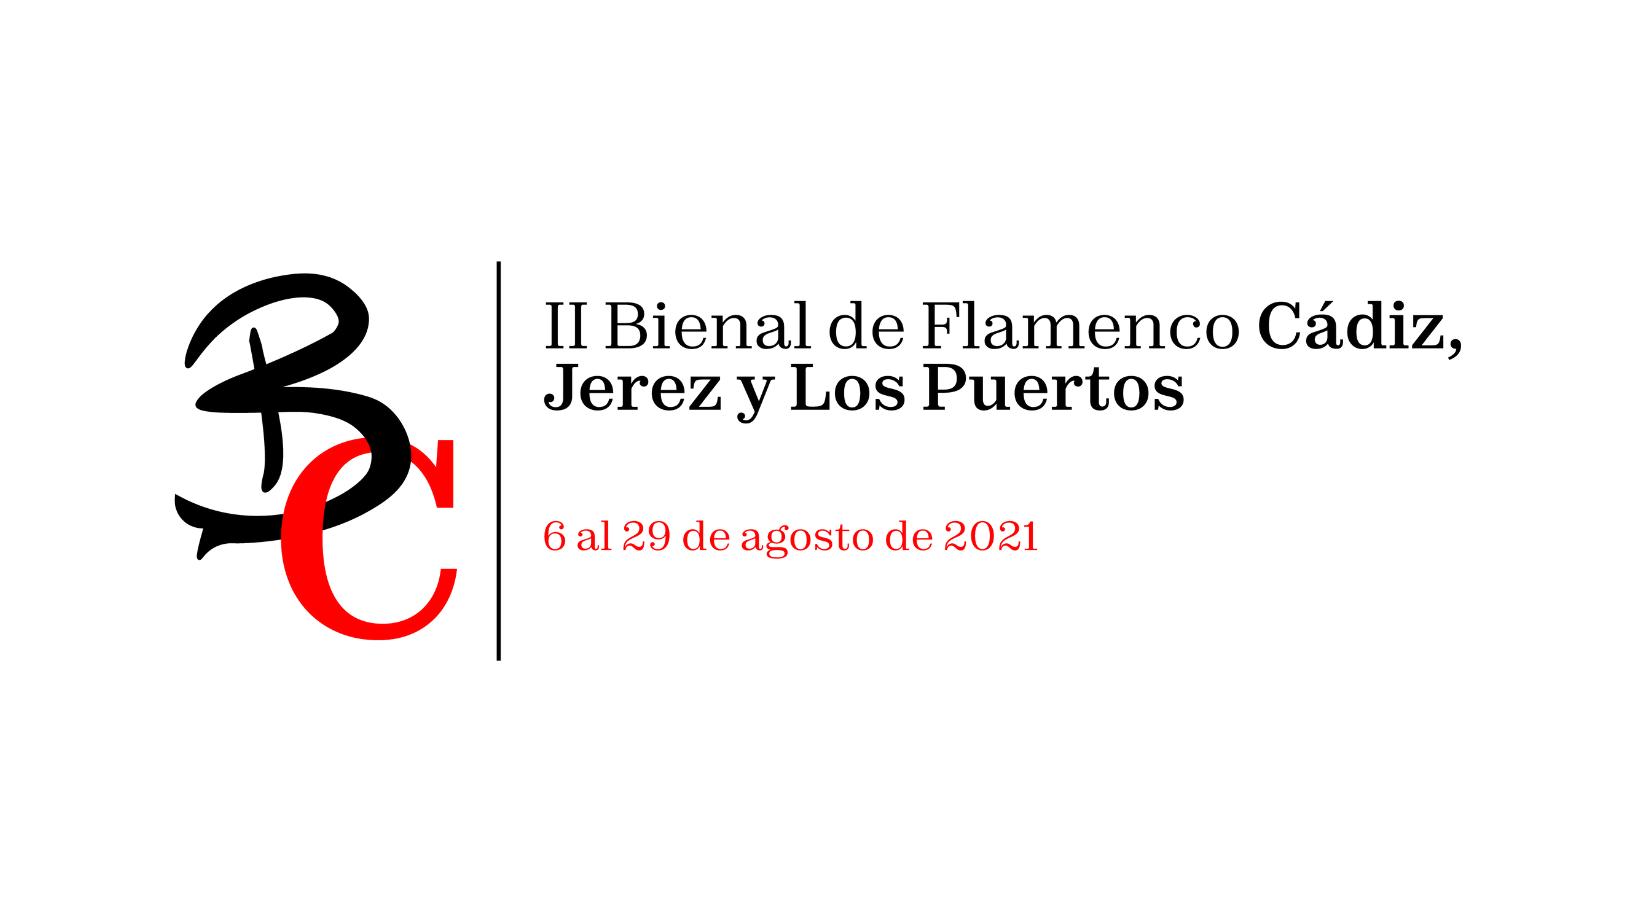 Gala Flamenca Sanlúcar - II Bienal de Flamenco